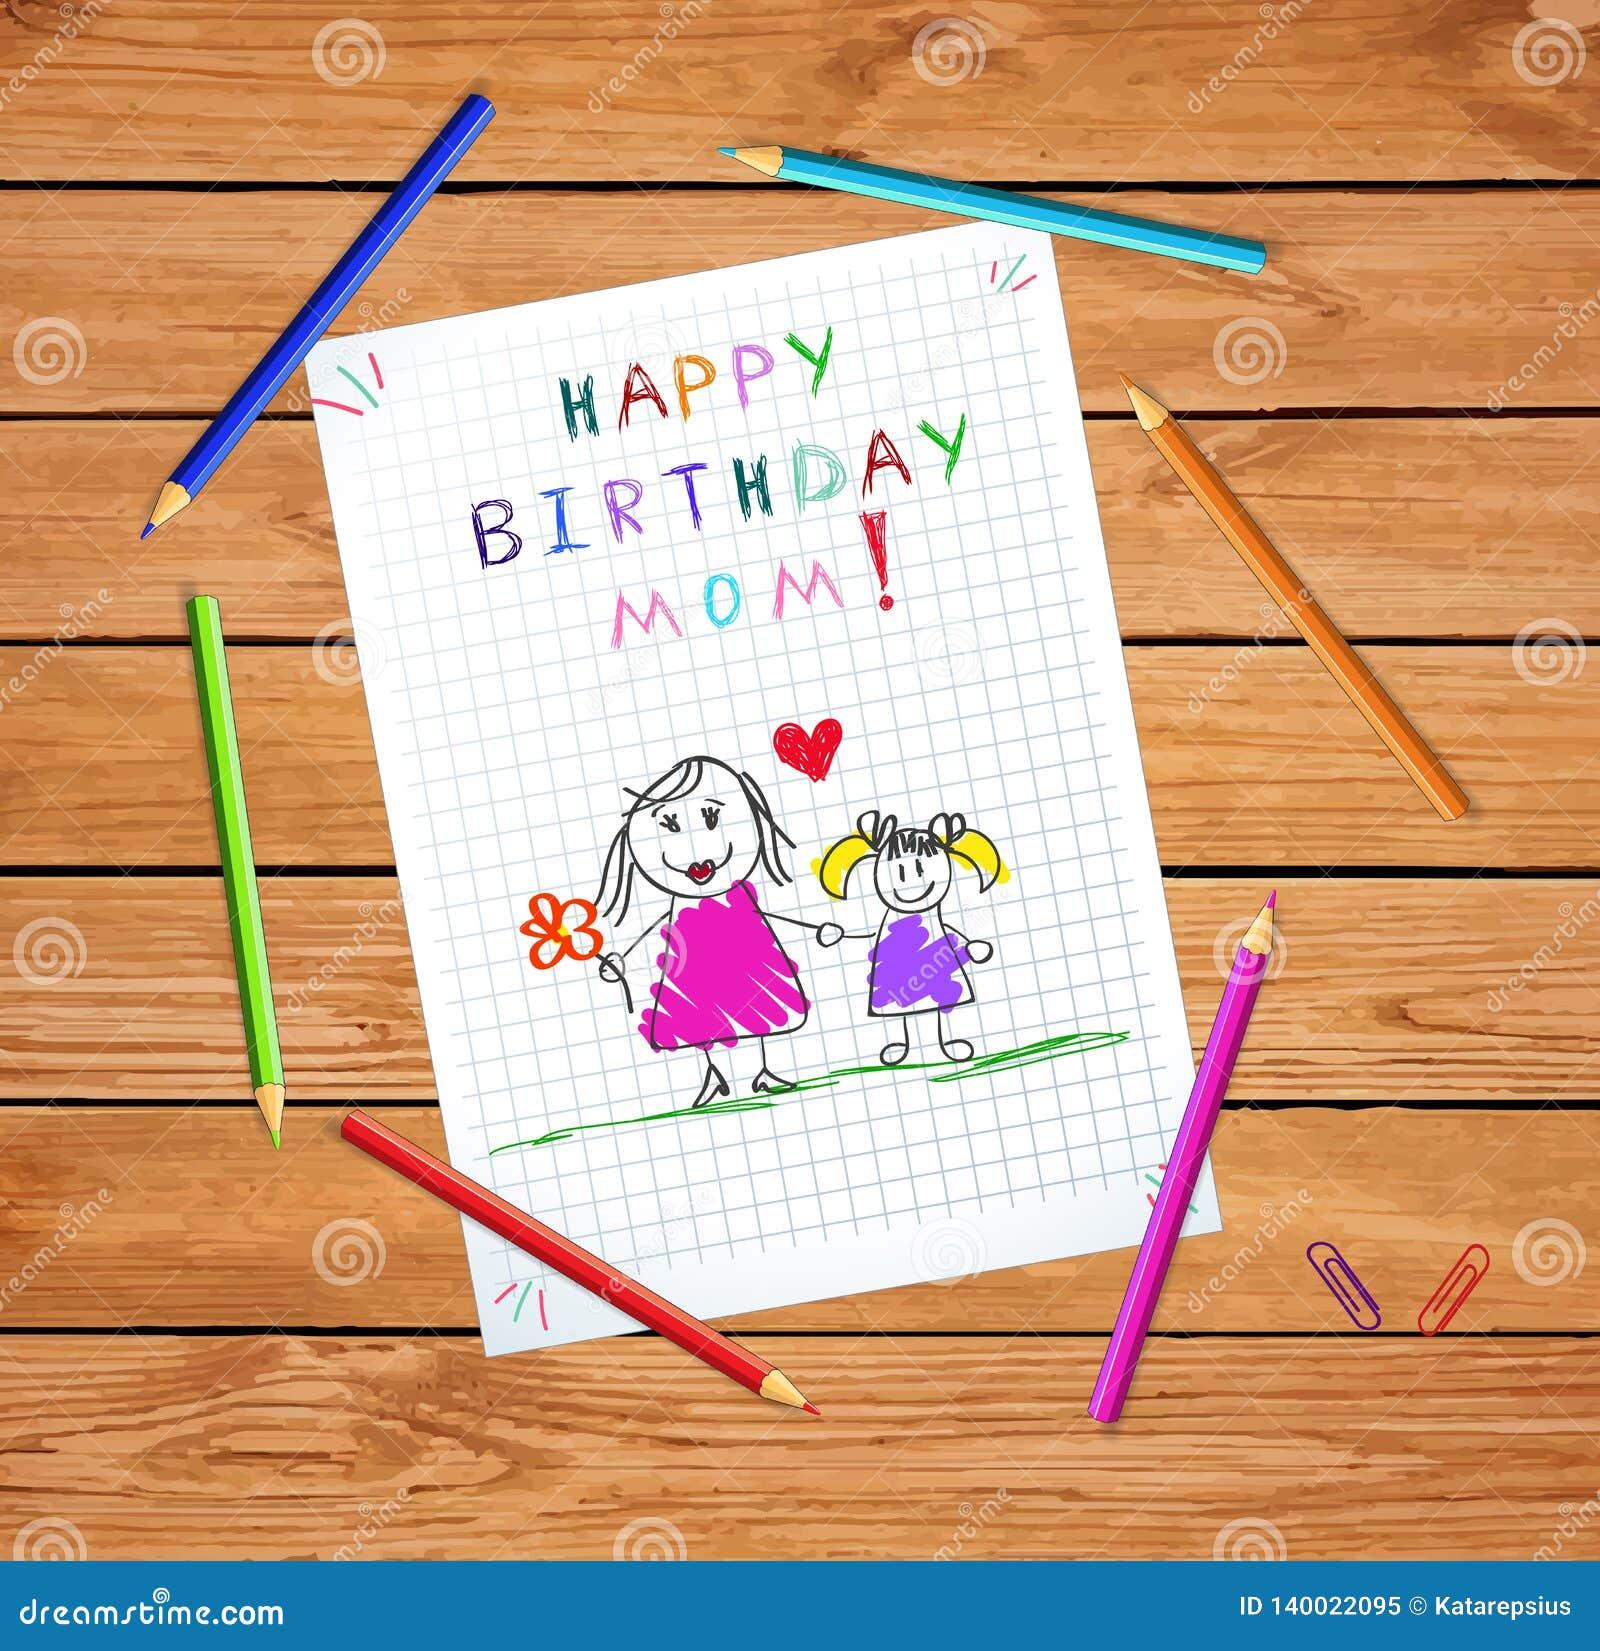 Happy Birthday Mom Kids Hand Drawn Illustration Stock Illustration